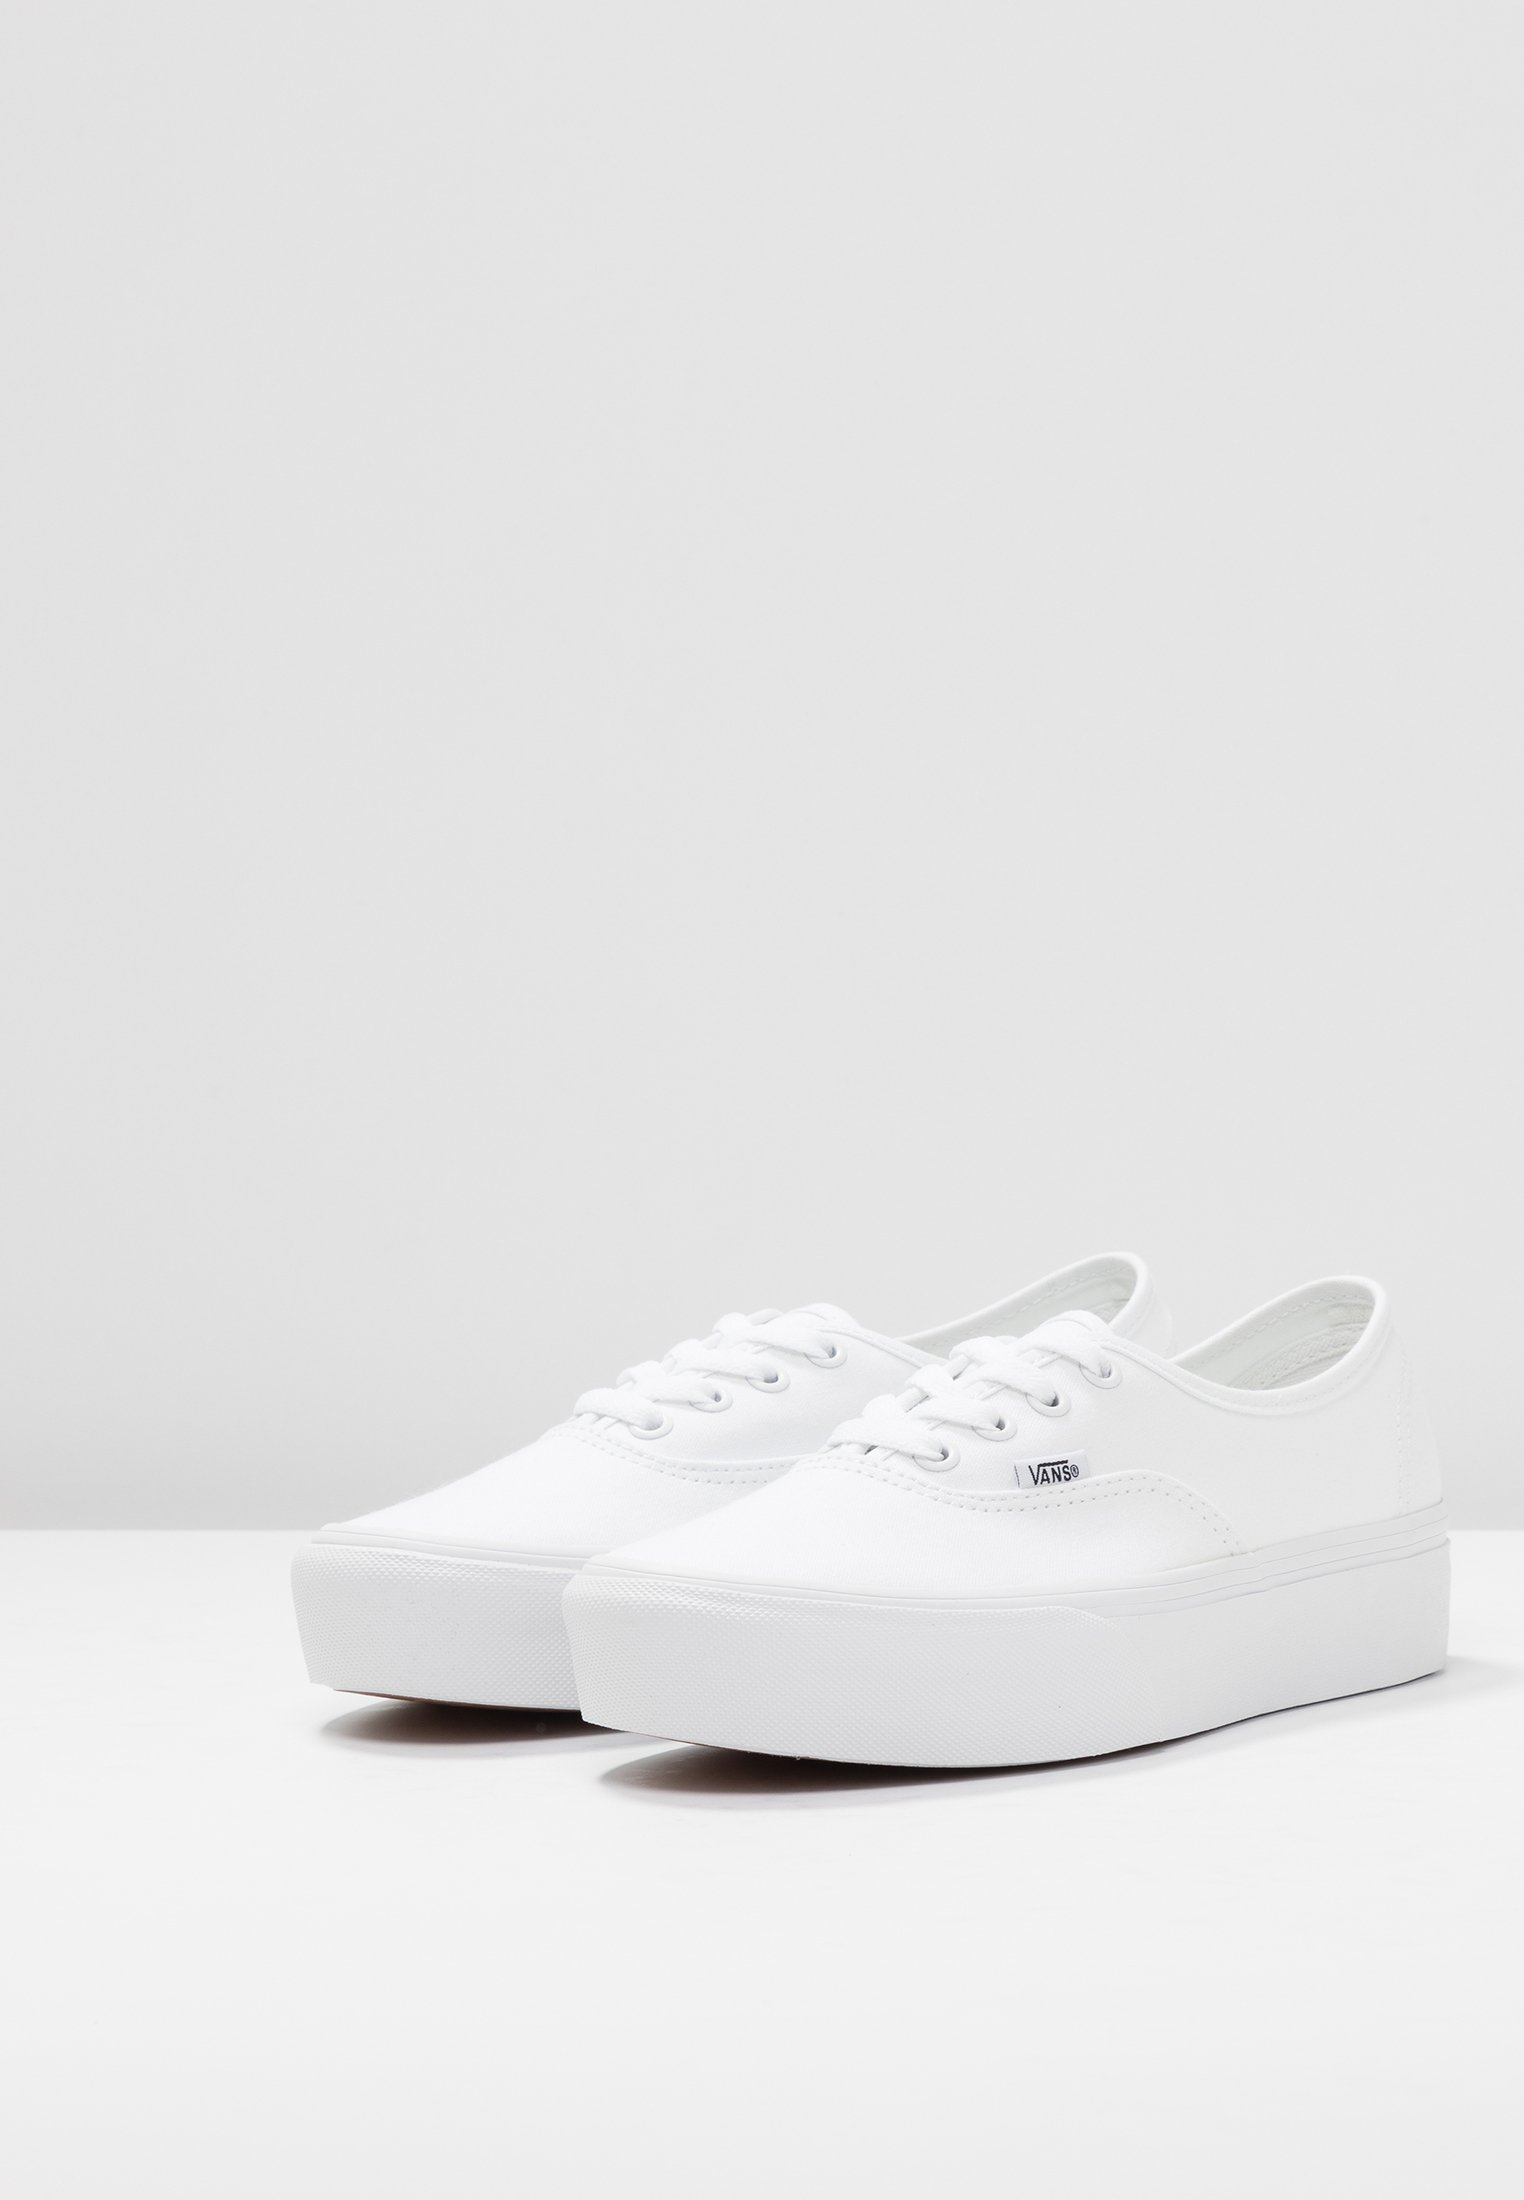 VANS Authentic Platform 2.0 Classic White & True White